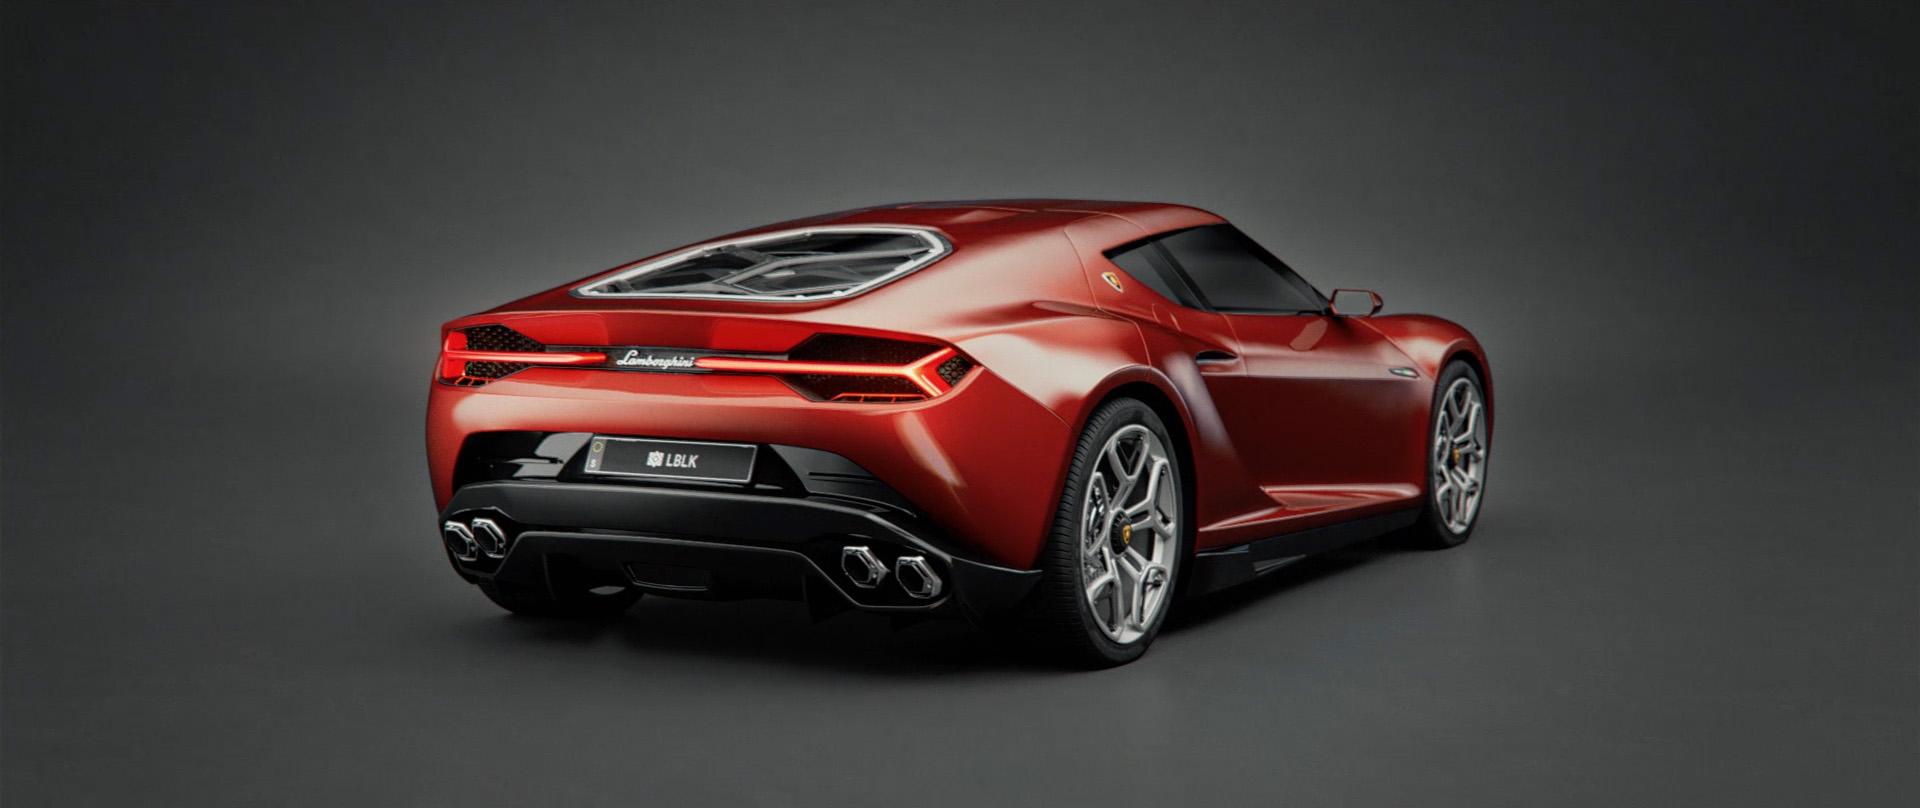 Lamborghini Astarion - Animation